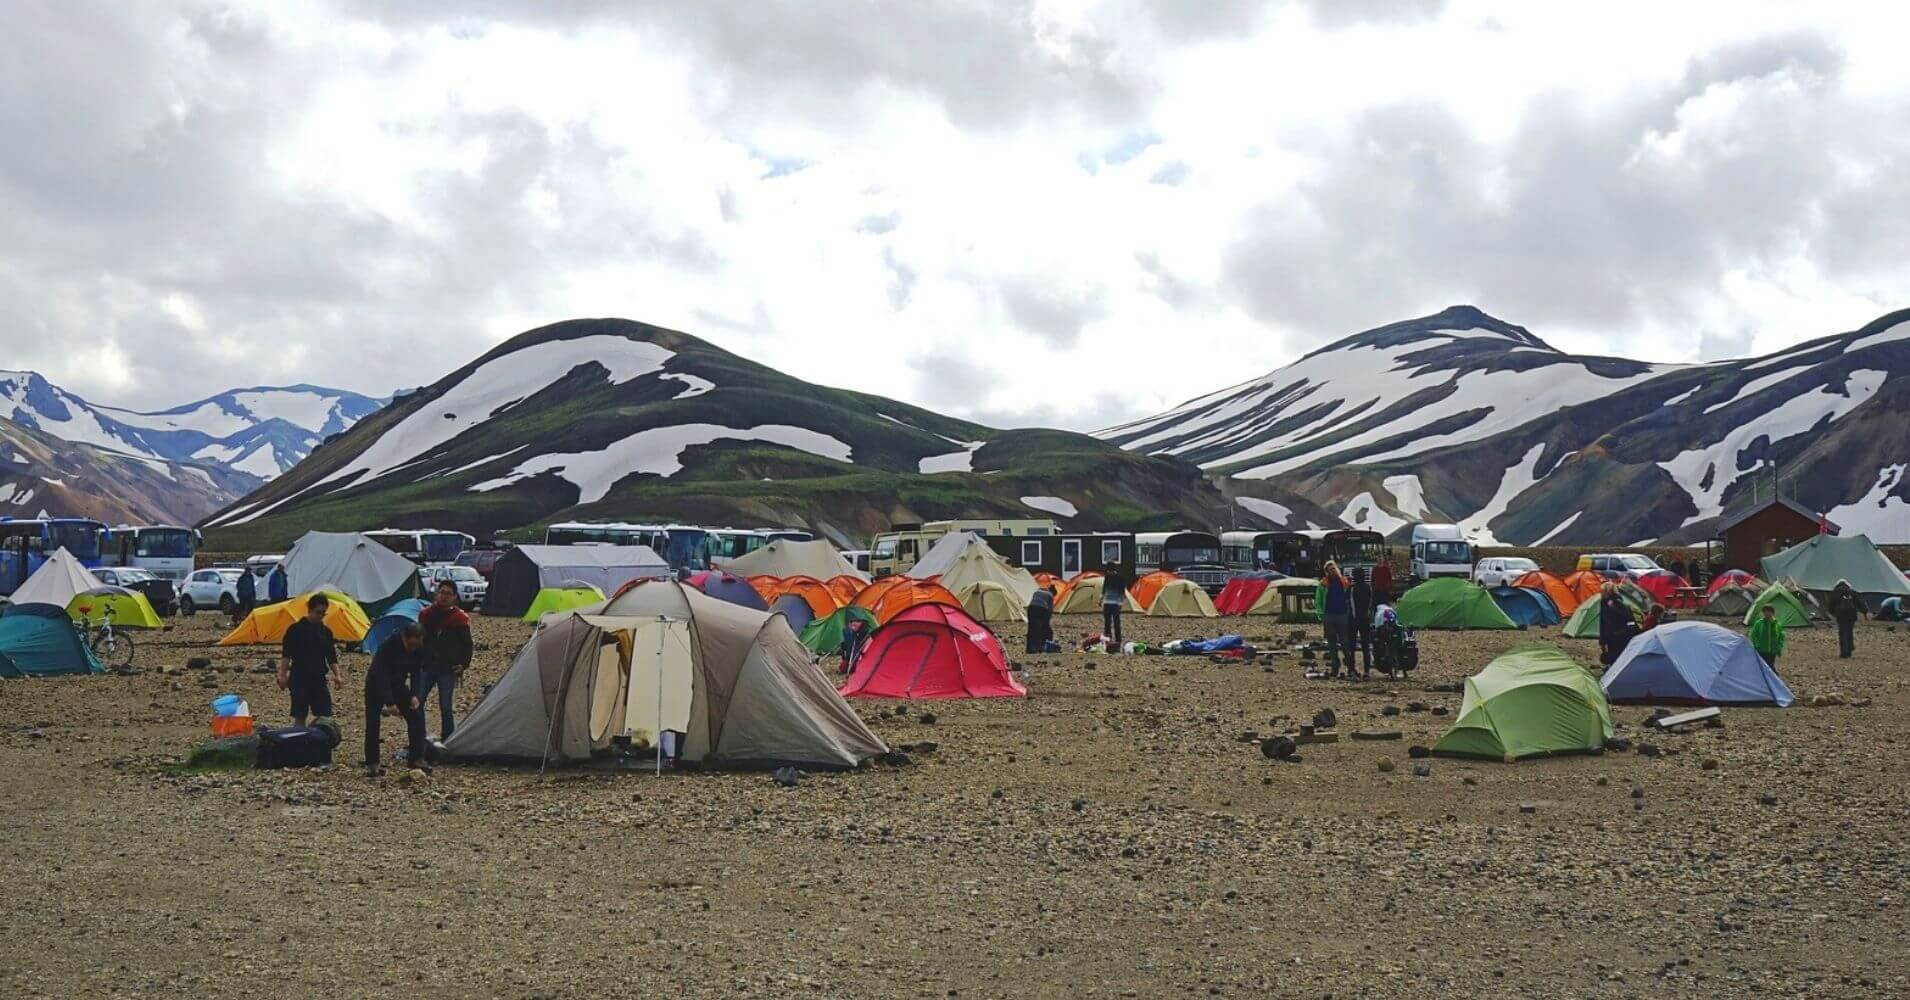 Acampada en Landmannalaugar. Iceland.